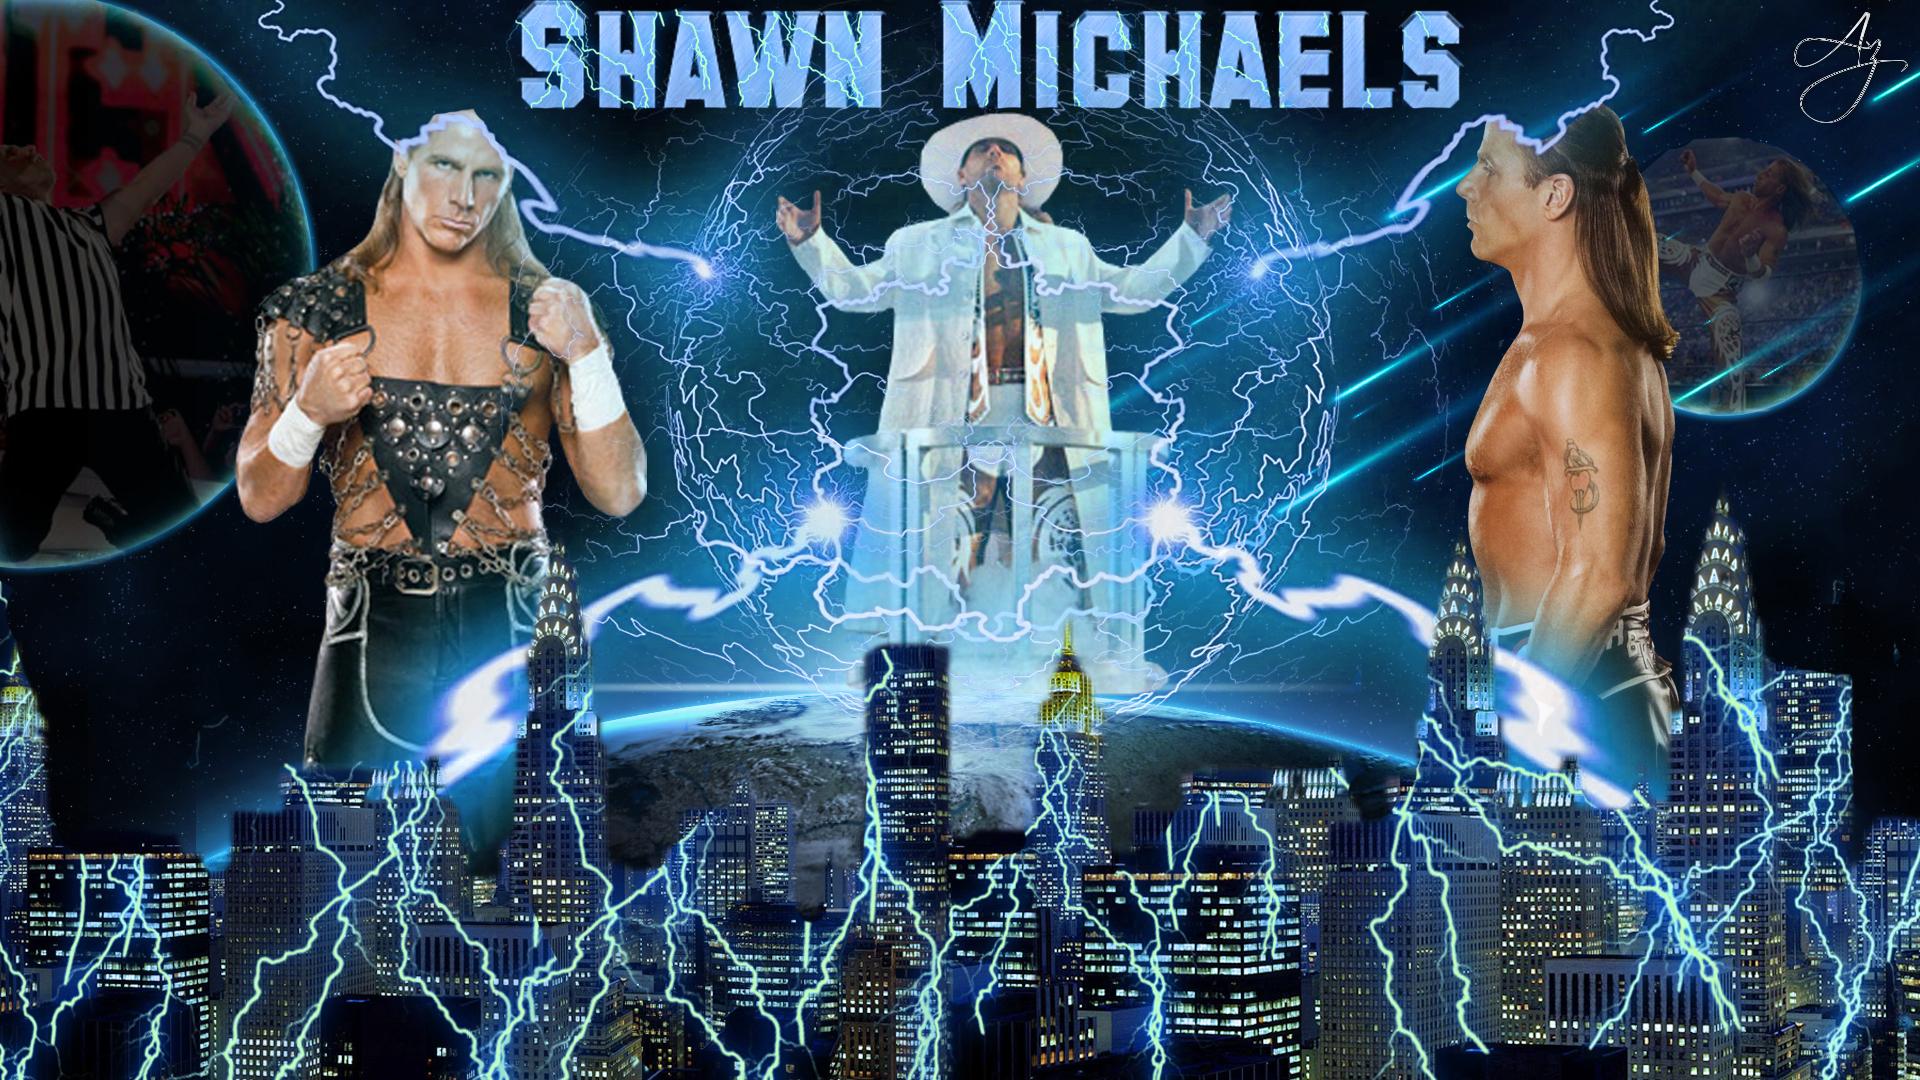 Shawn Michaels HD Wallpaper by FunkyAli on DeviantArt